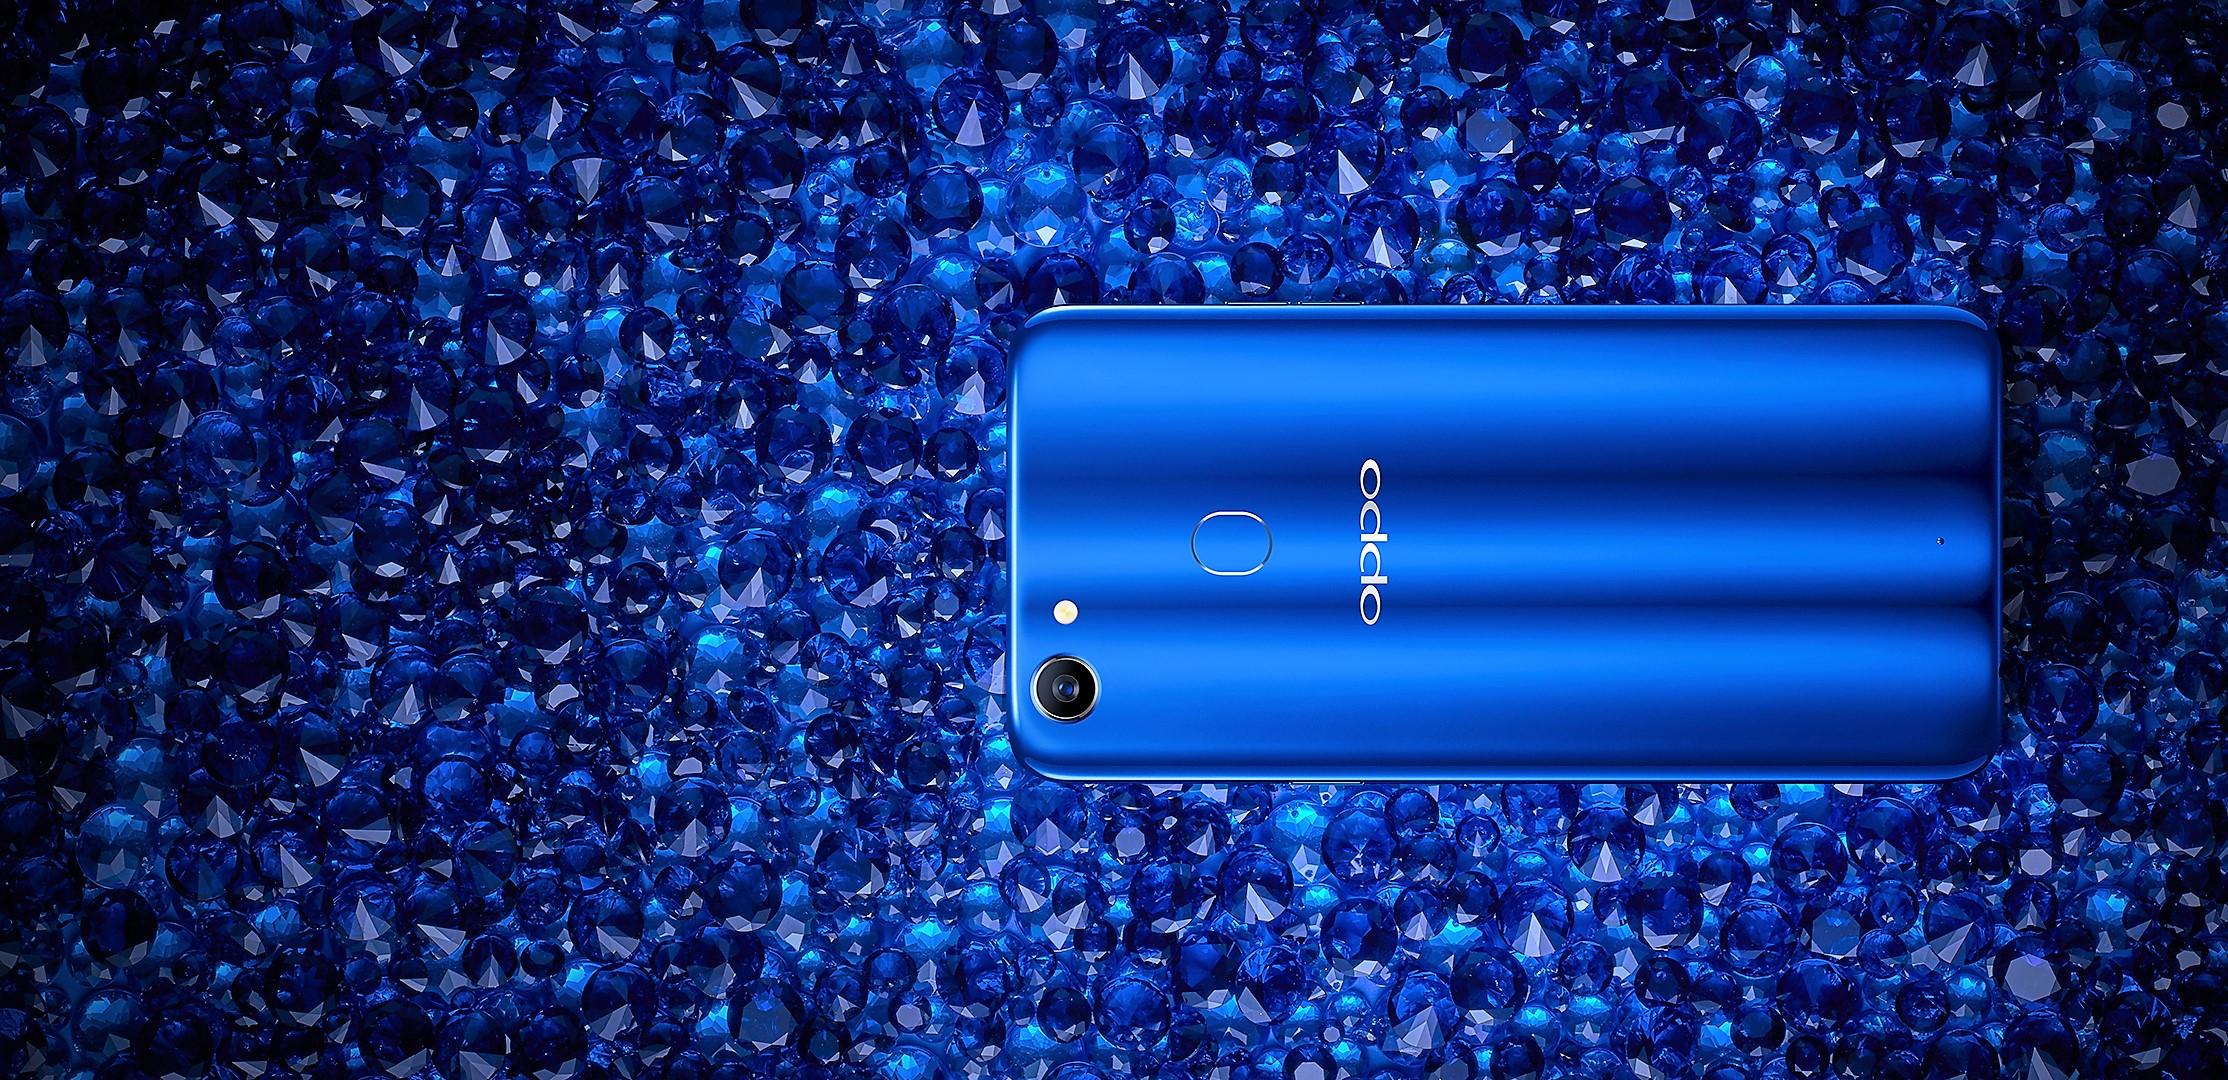 Oppo F5 Biru Limited Edition Habis Terjual Dalam 2 Menit